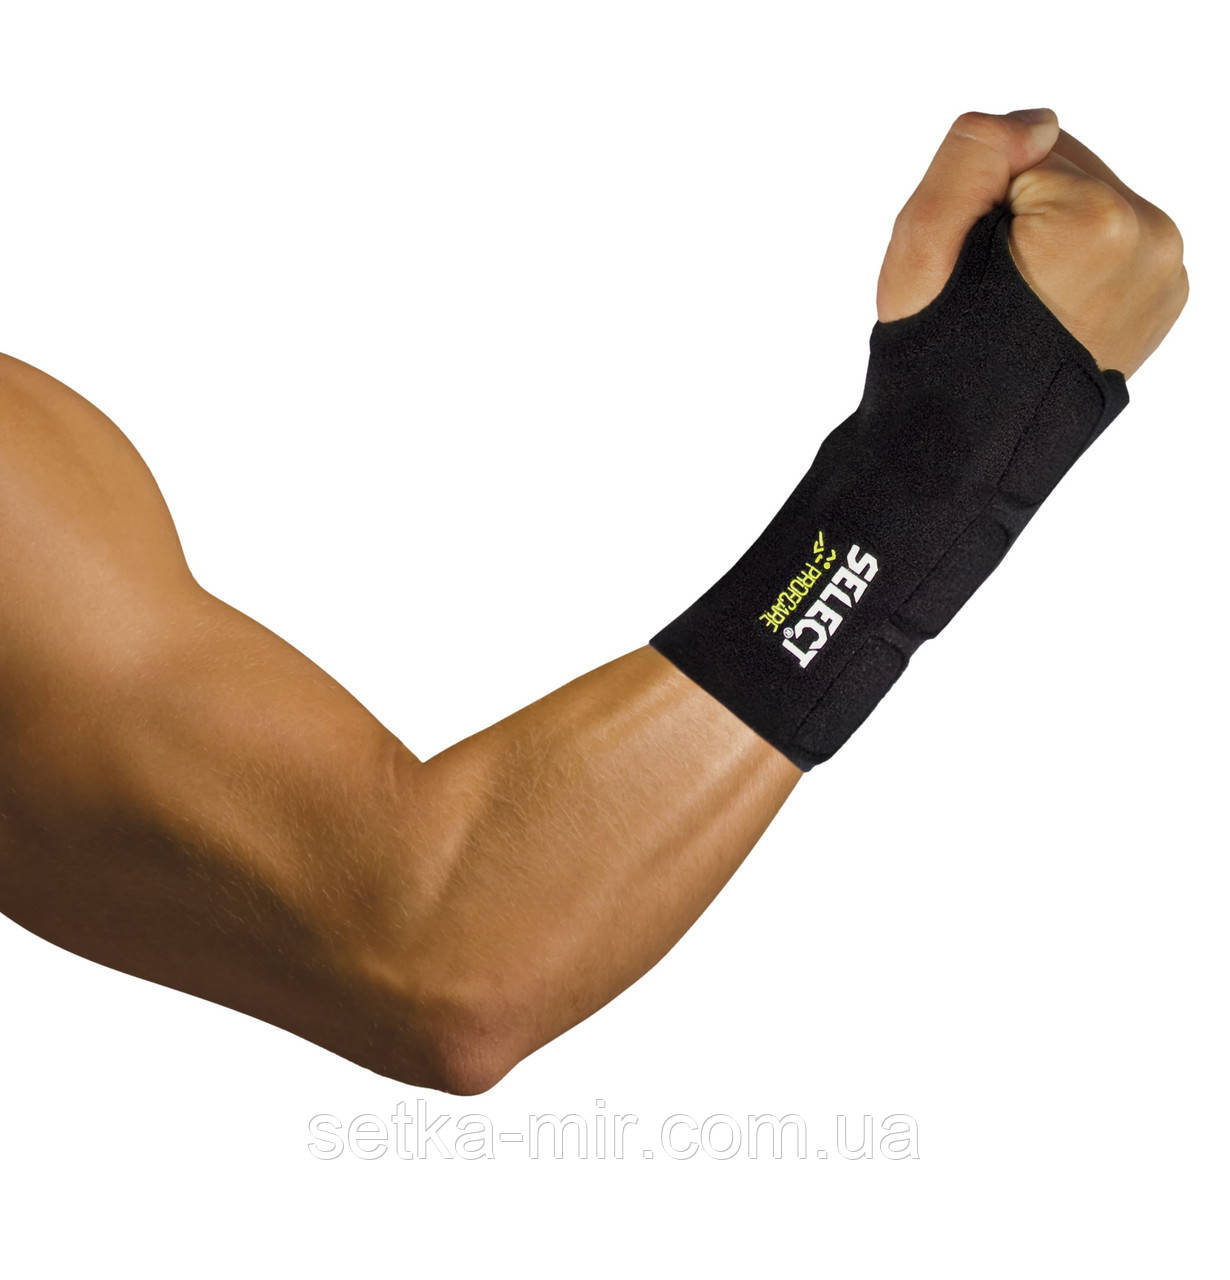 Бандаж Select Wrist support 6701  SELECT Wrist support 6701 XL/XXL, фото 1